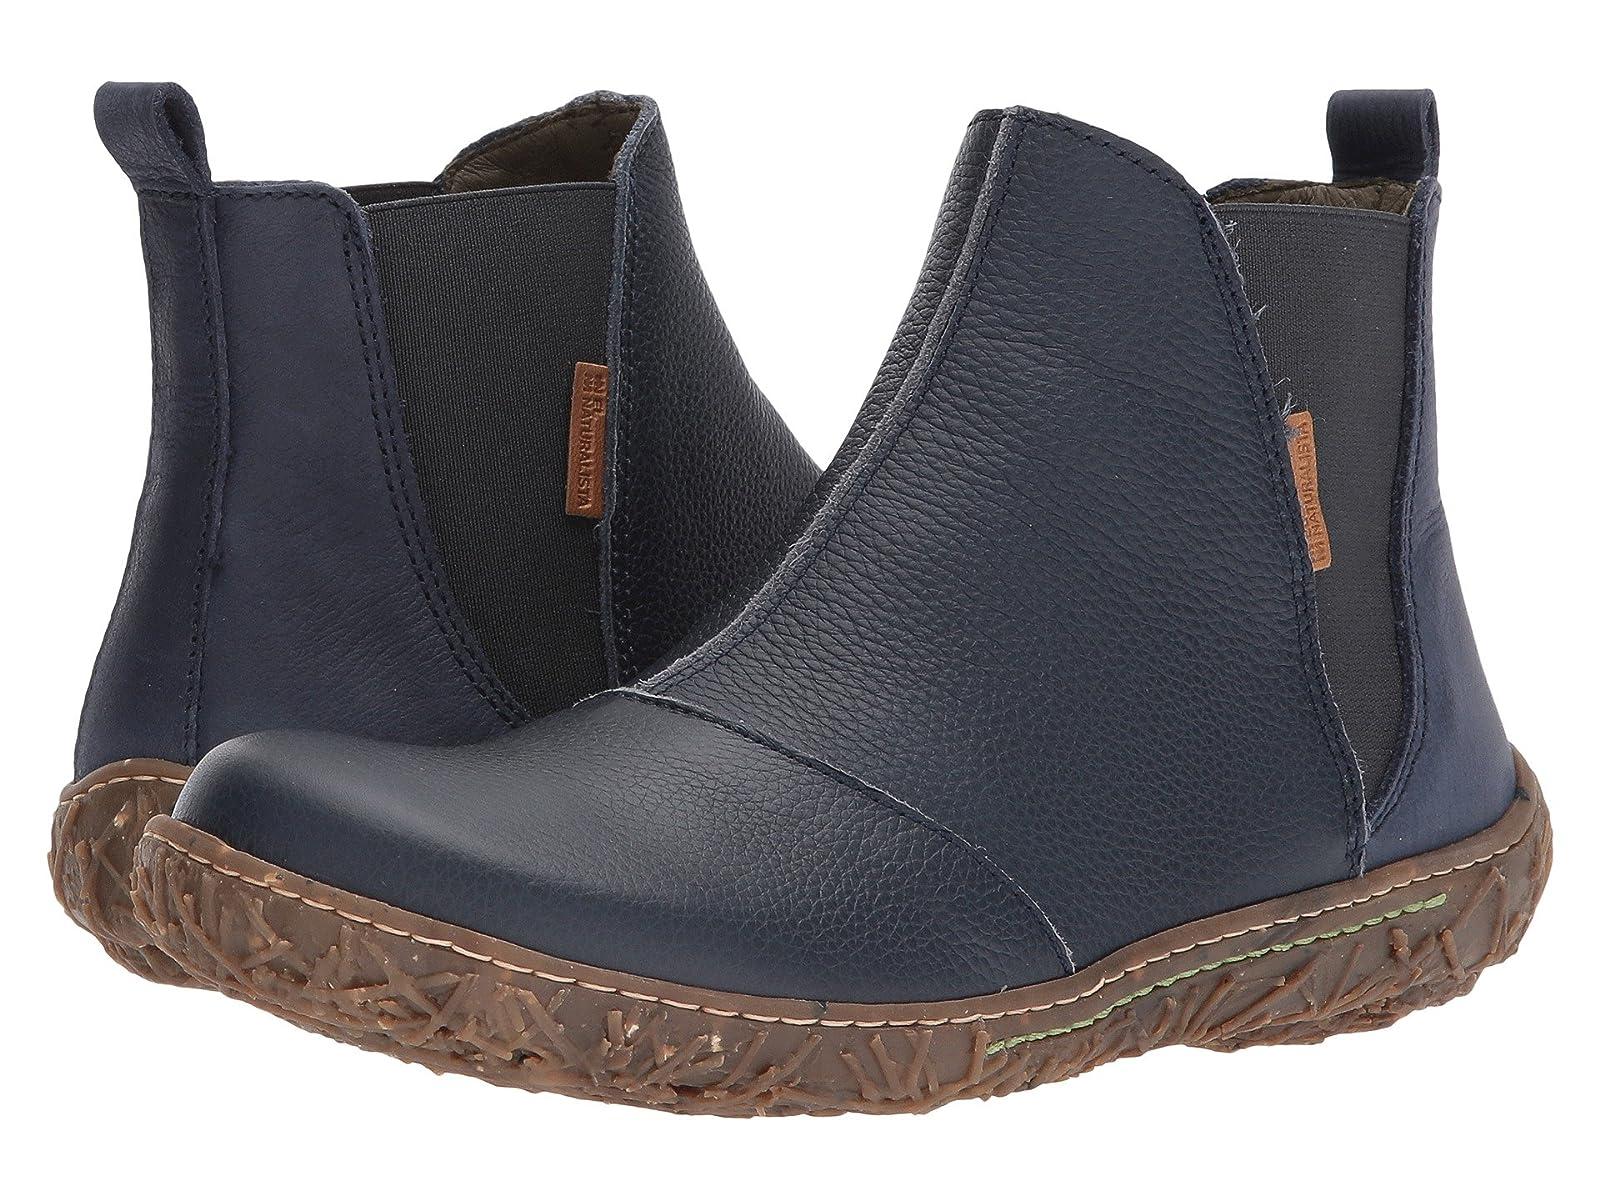 El Naturalista Nido N786Affordable and distinctive shoes